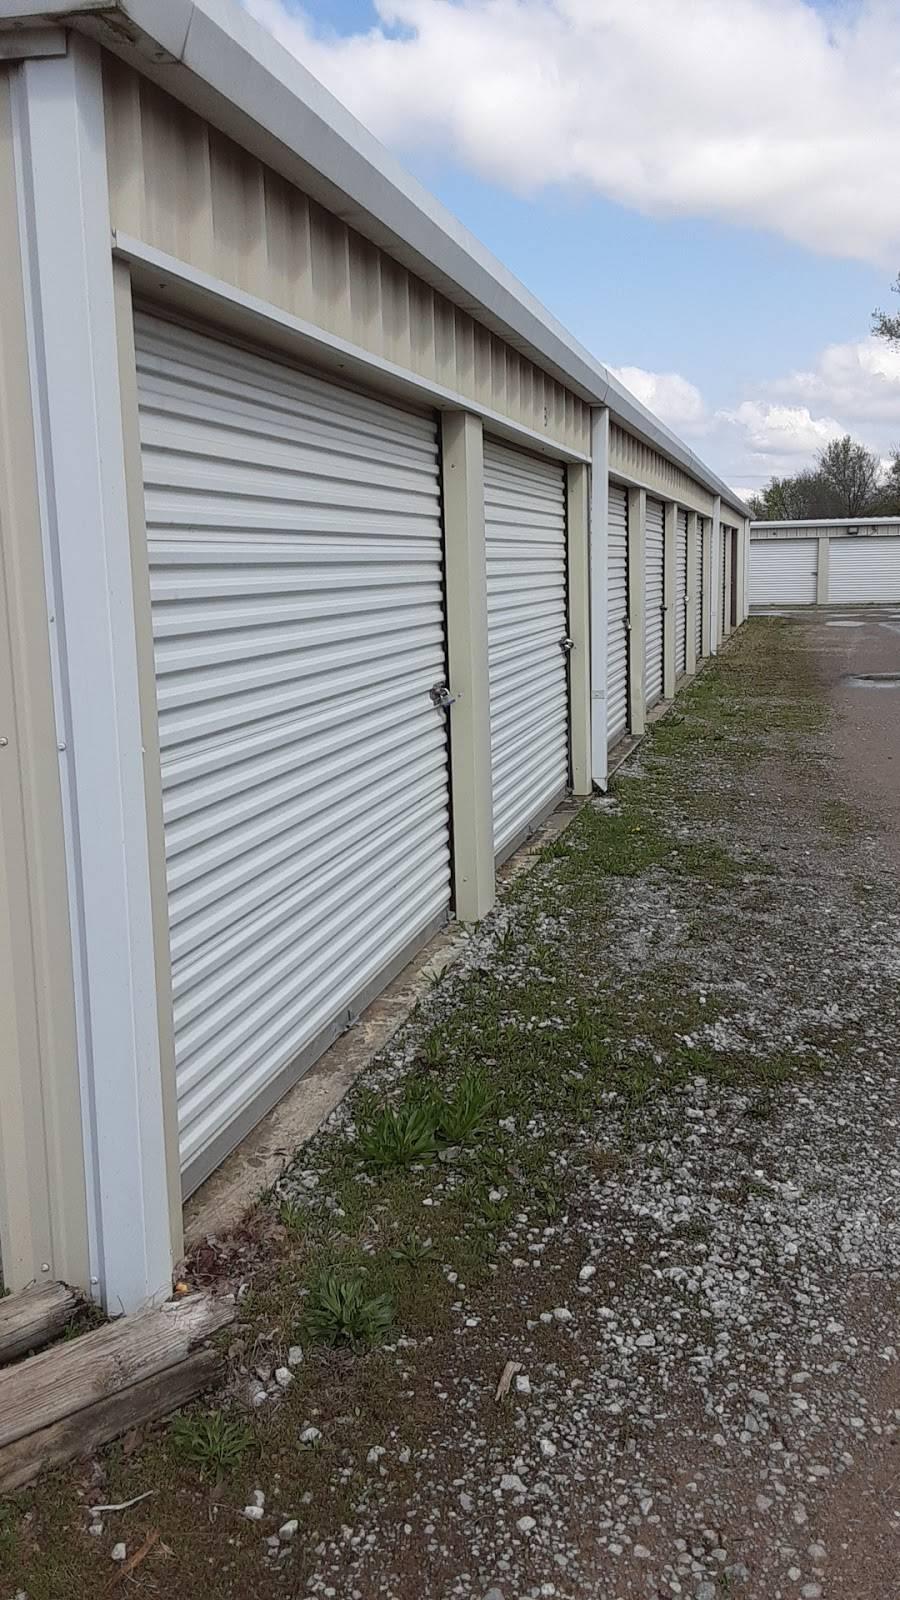 Fort Apache Glass & Lumber - car repair  | Photo 6 of 6 | Address: 2703 E Apache St, Tulsa, OK 74110, USA | Phone: (918) 425-5902